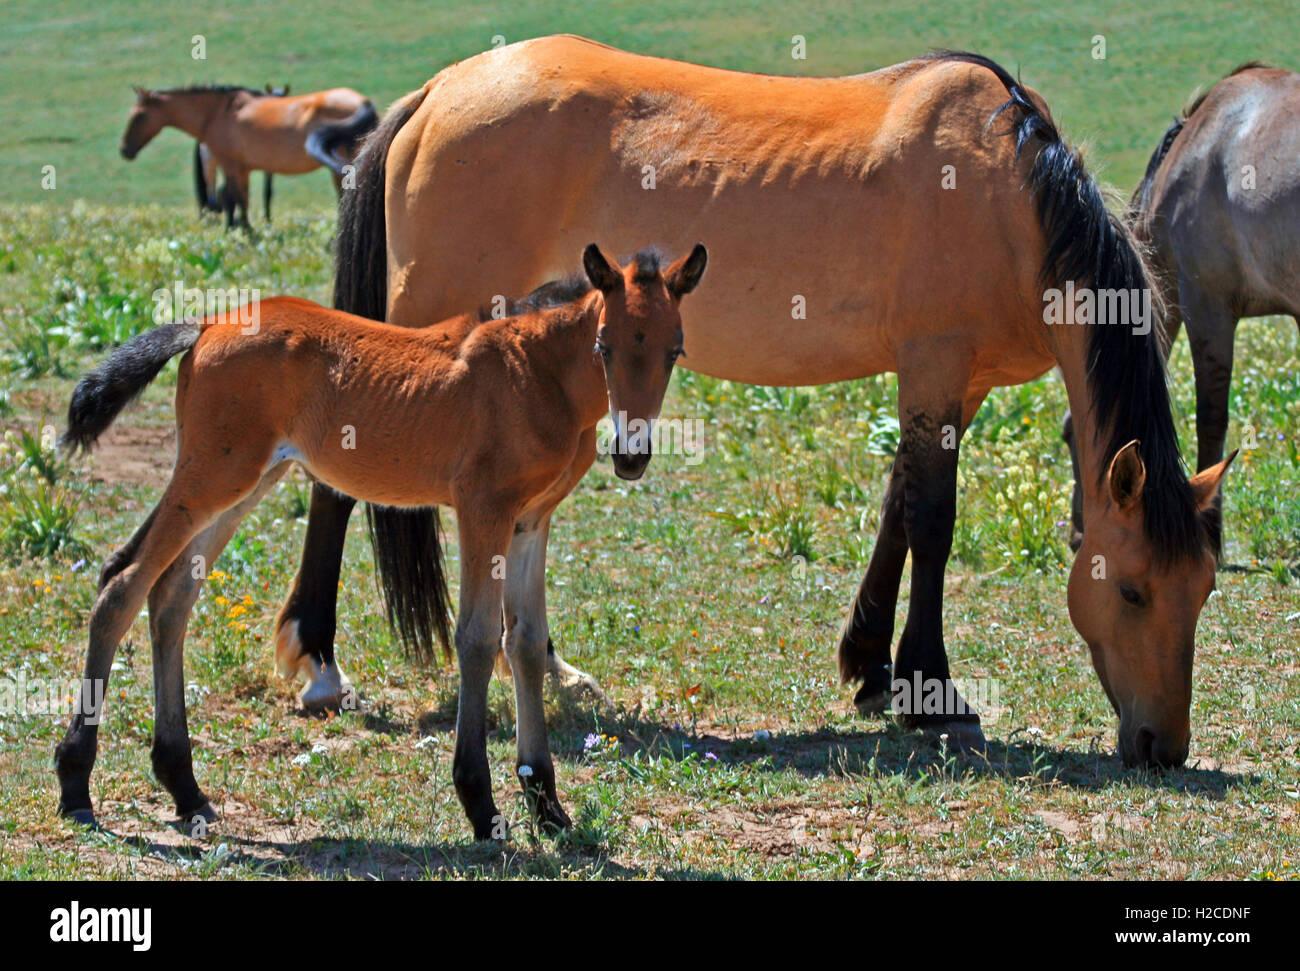 Buckskin quarter horse foal